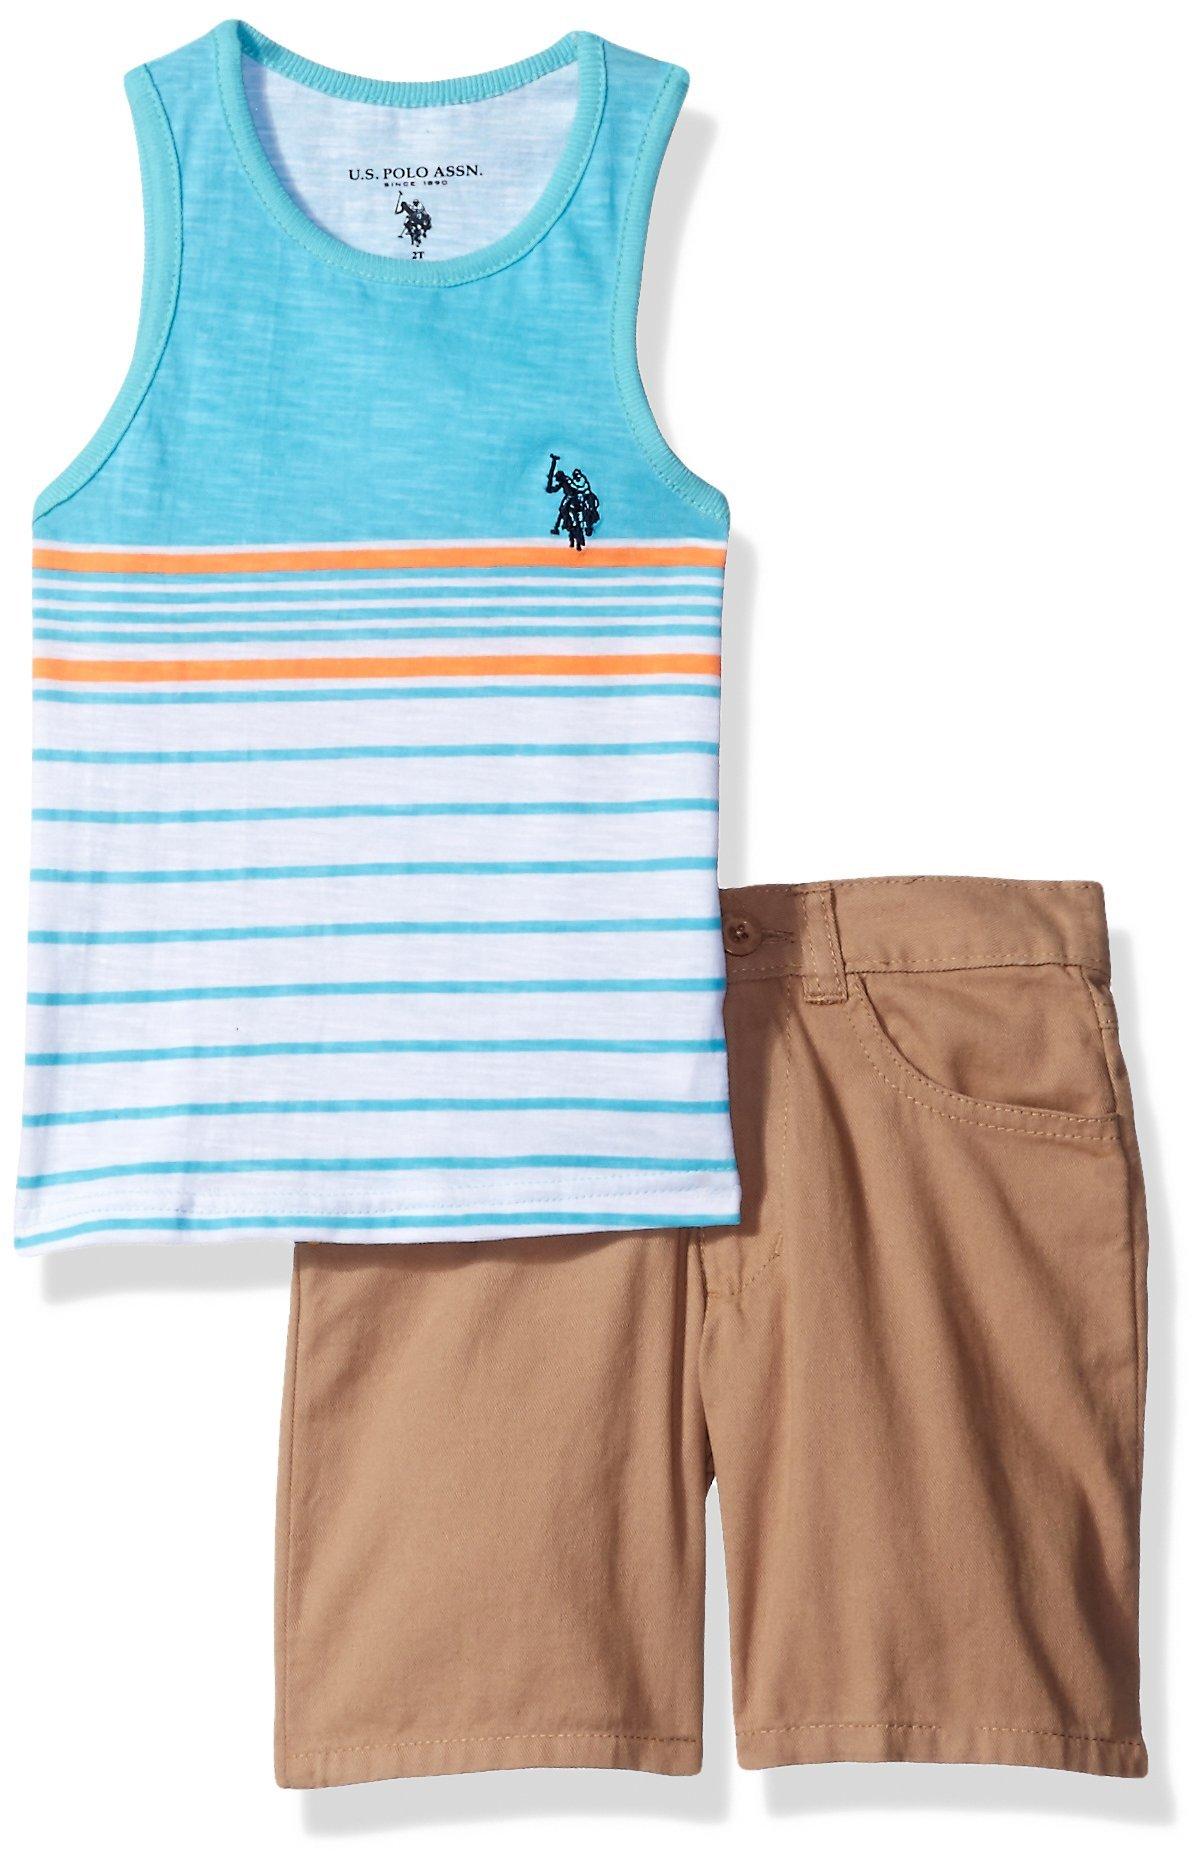 U.S. Polo Assn. Boys' Striped Tank Top and Four Pocket Twill Short Set, WL00-Gamma Blue, 6